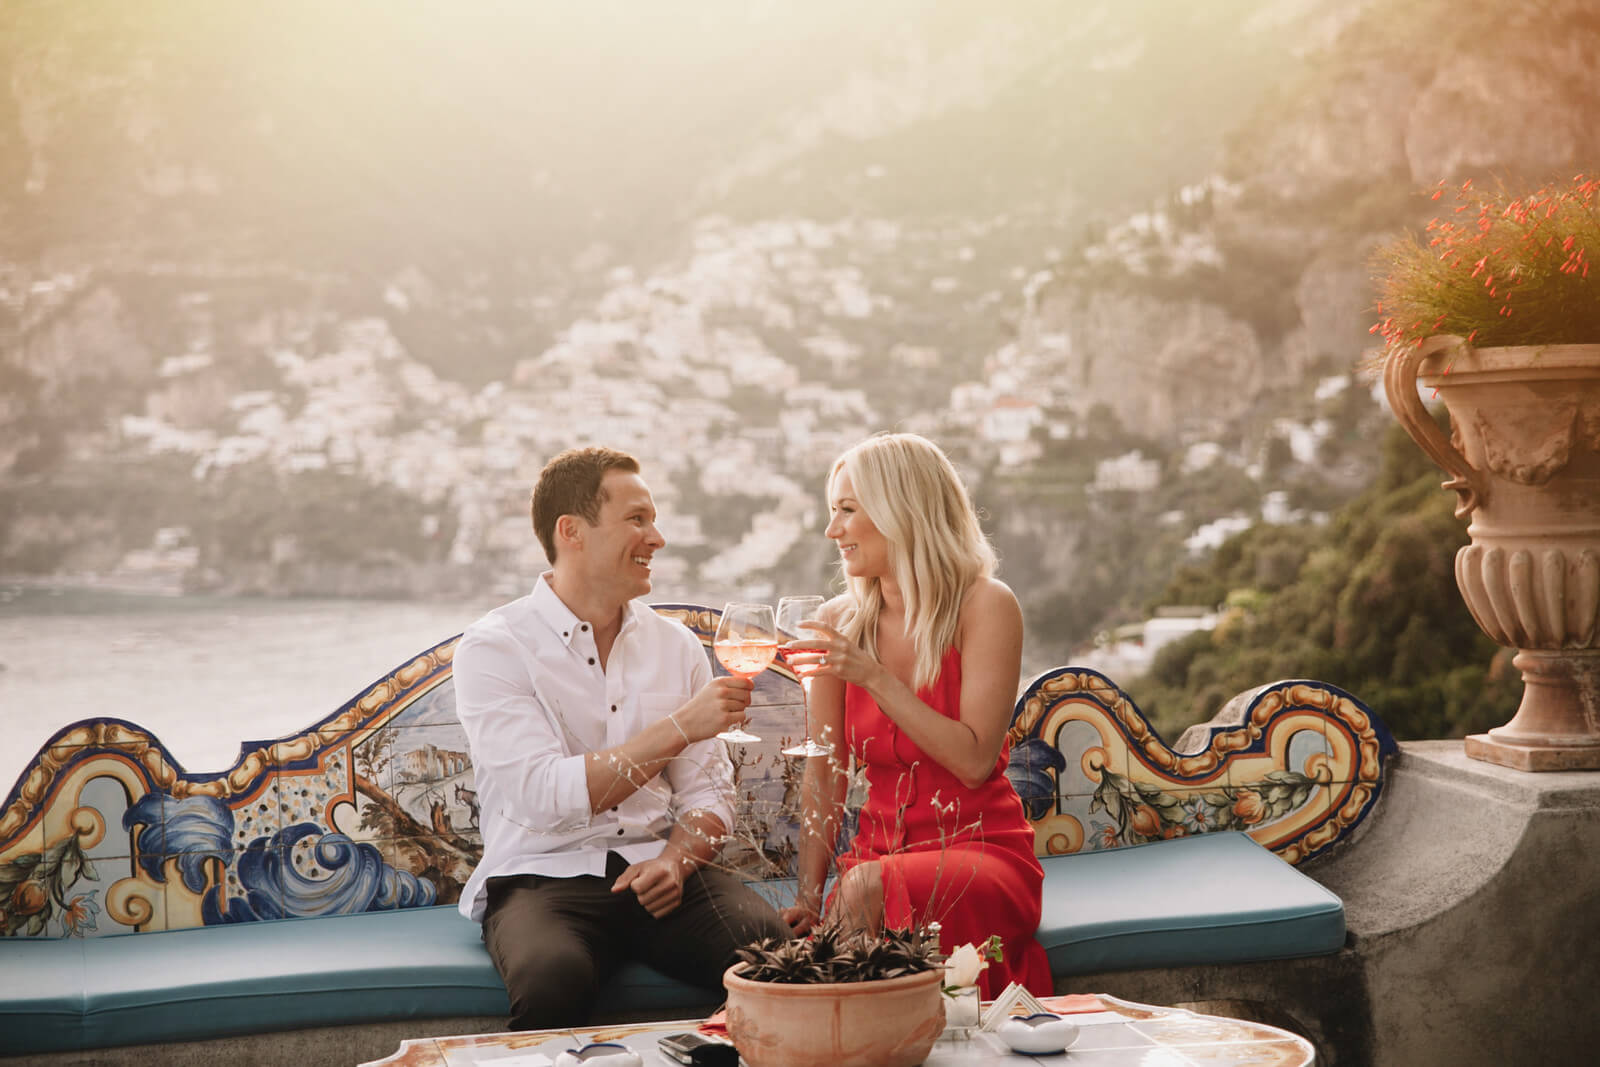 Couple toasting wine glasses together at sunset in Amalfi Coast, Italy